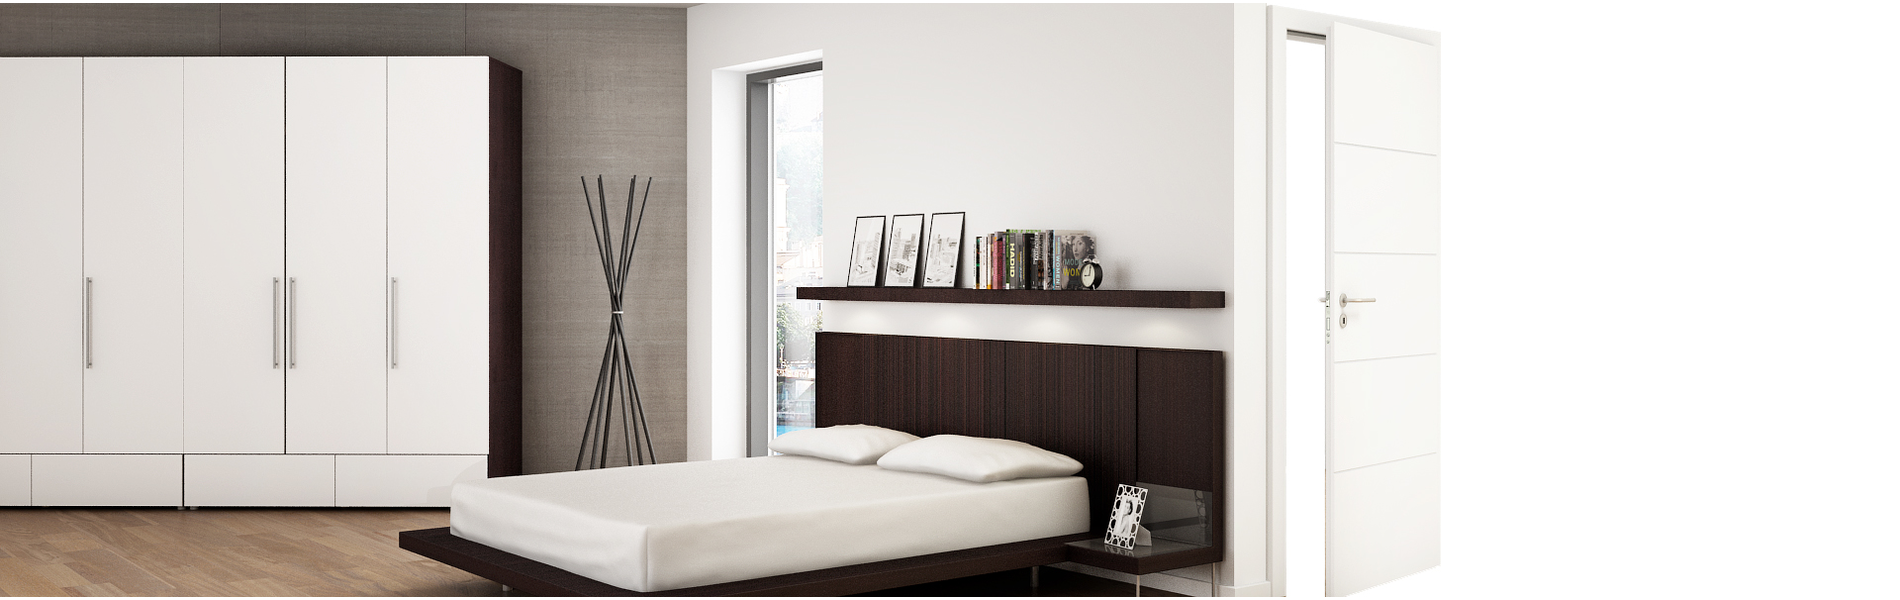 frischeis t ren sortiment. Black Bedroom Furniture Sets. Home Design Ideas